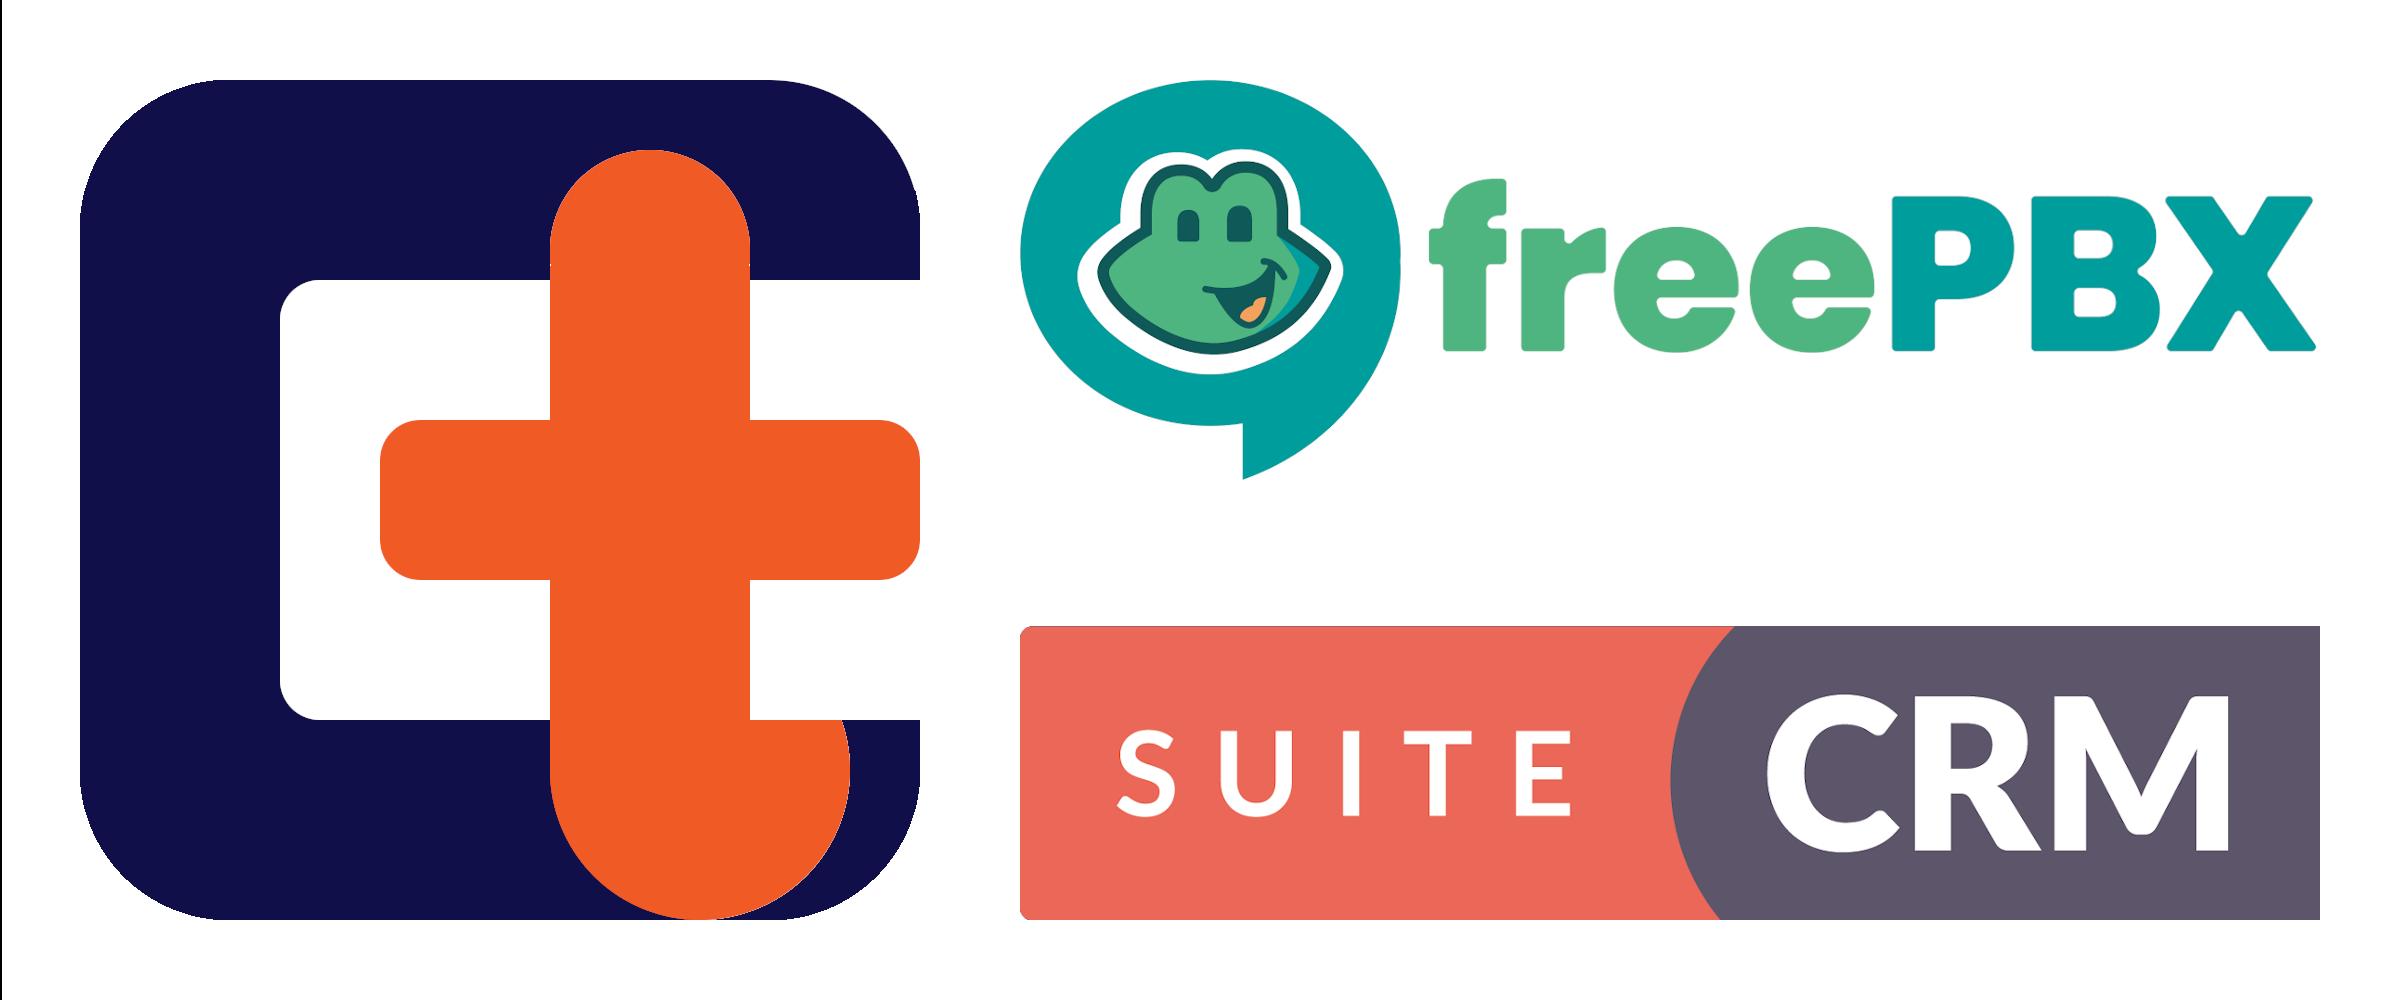 SuiteCRM FreePBX Integration Logo